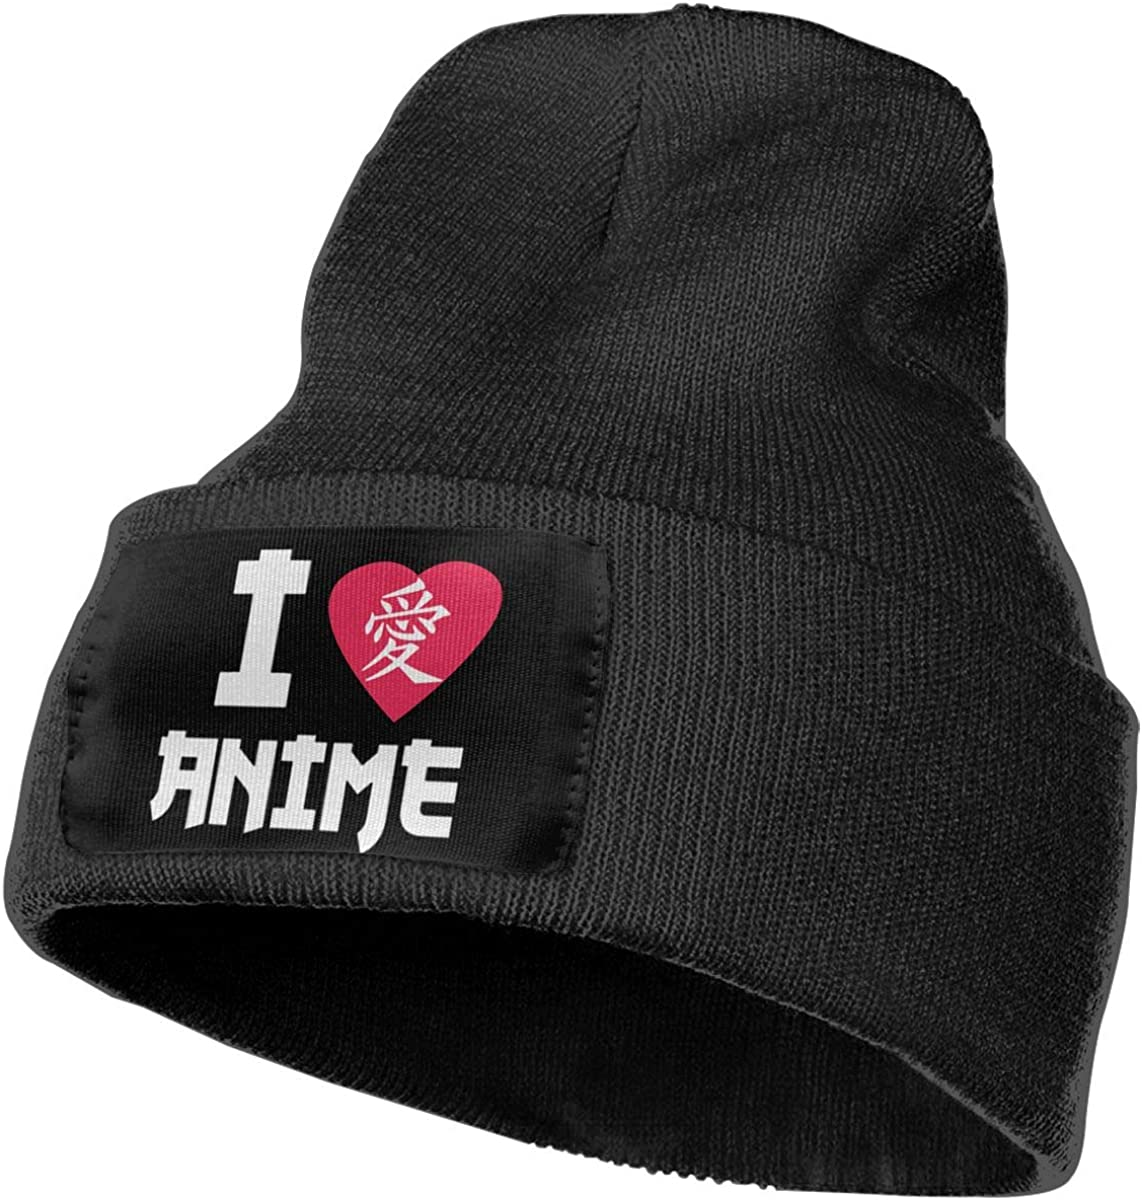 I Love Anime in Japanese Lover Warm Winter Hat Knit Beanie Skull Cap Cuff Beanie Hat Winter Hats for Men /& Women